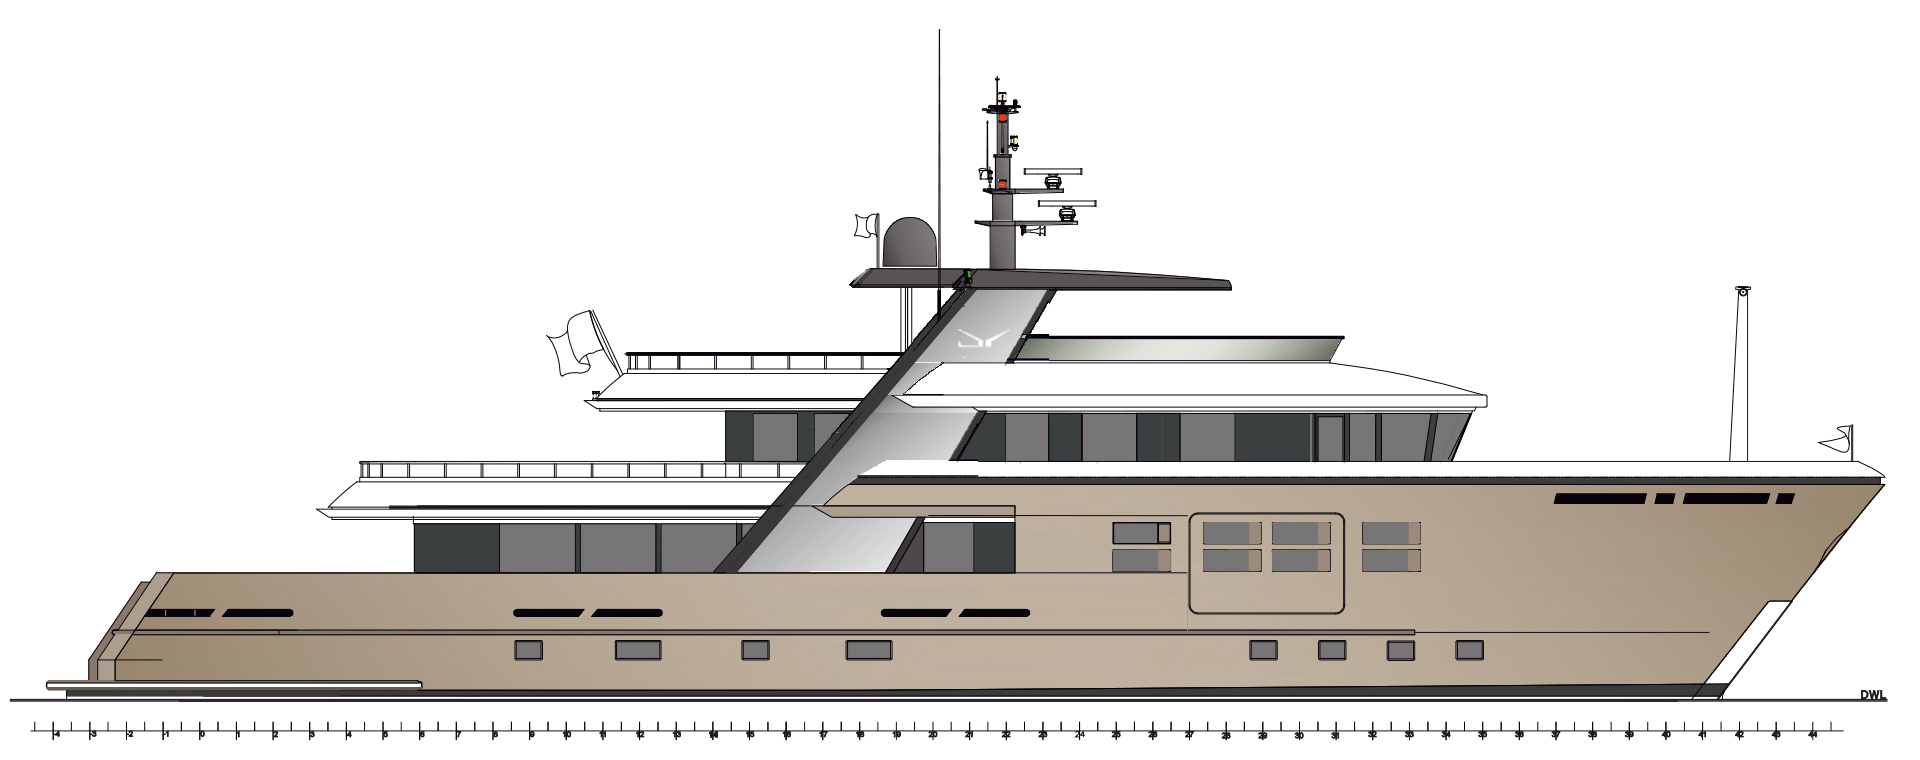 Bandido 132 - Bandido Yachts by Drettmann - Drettmann Yachts